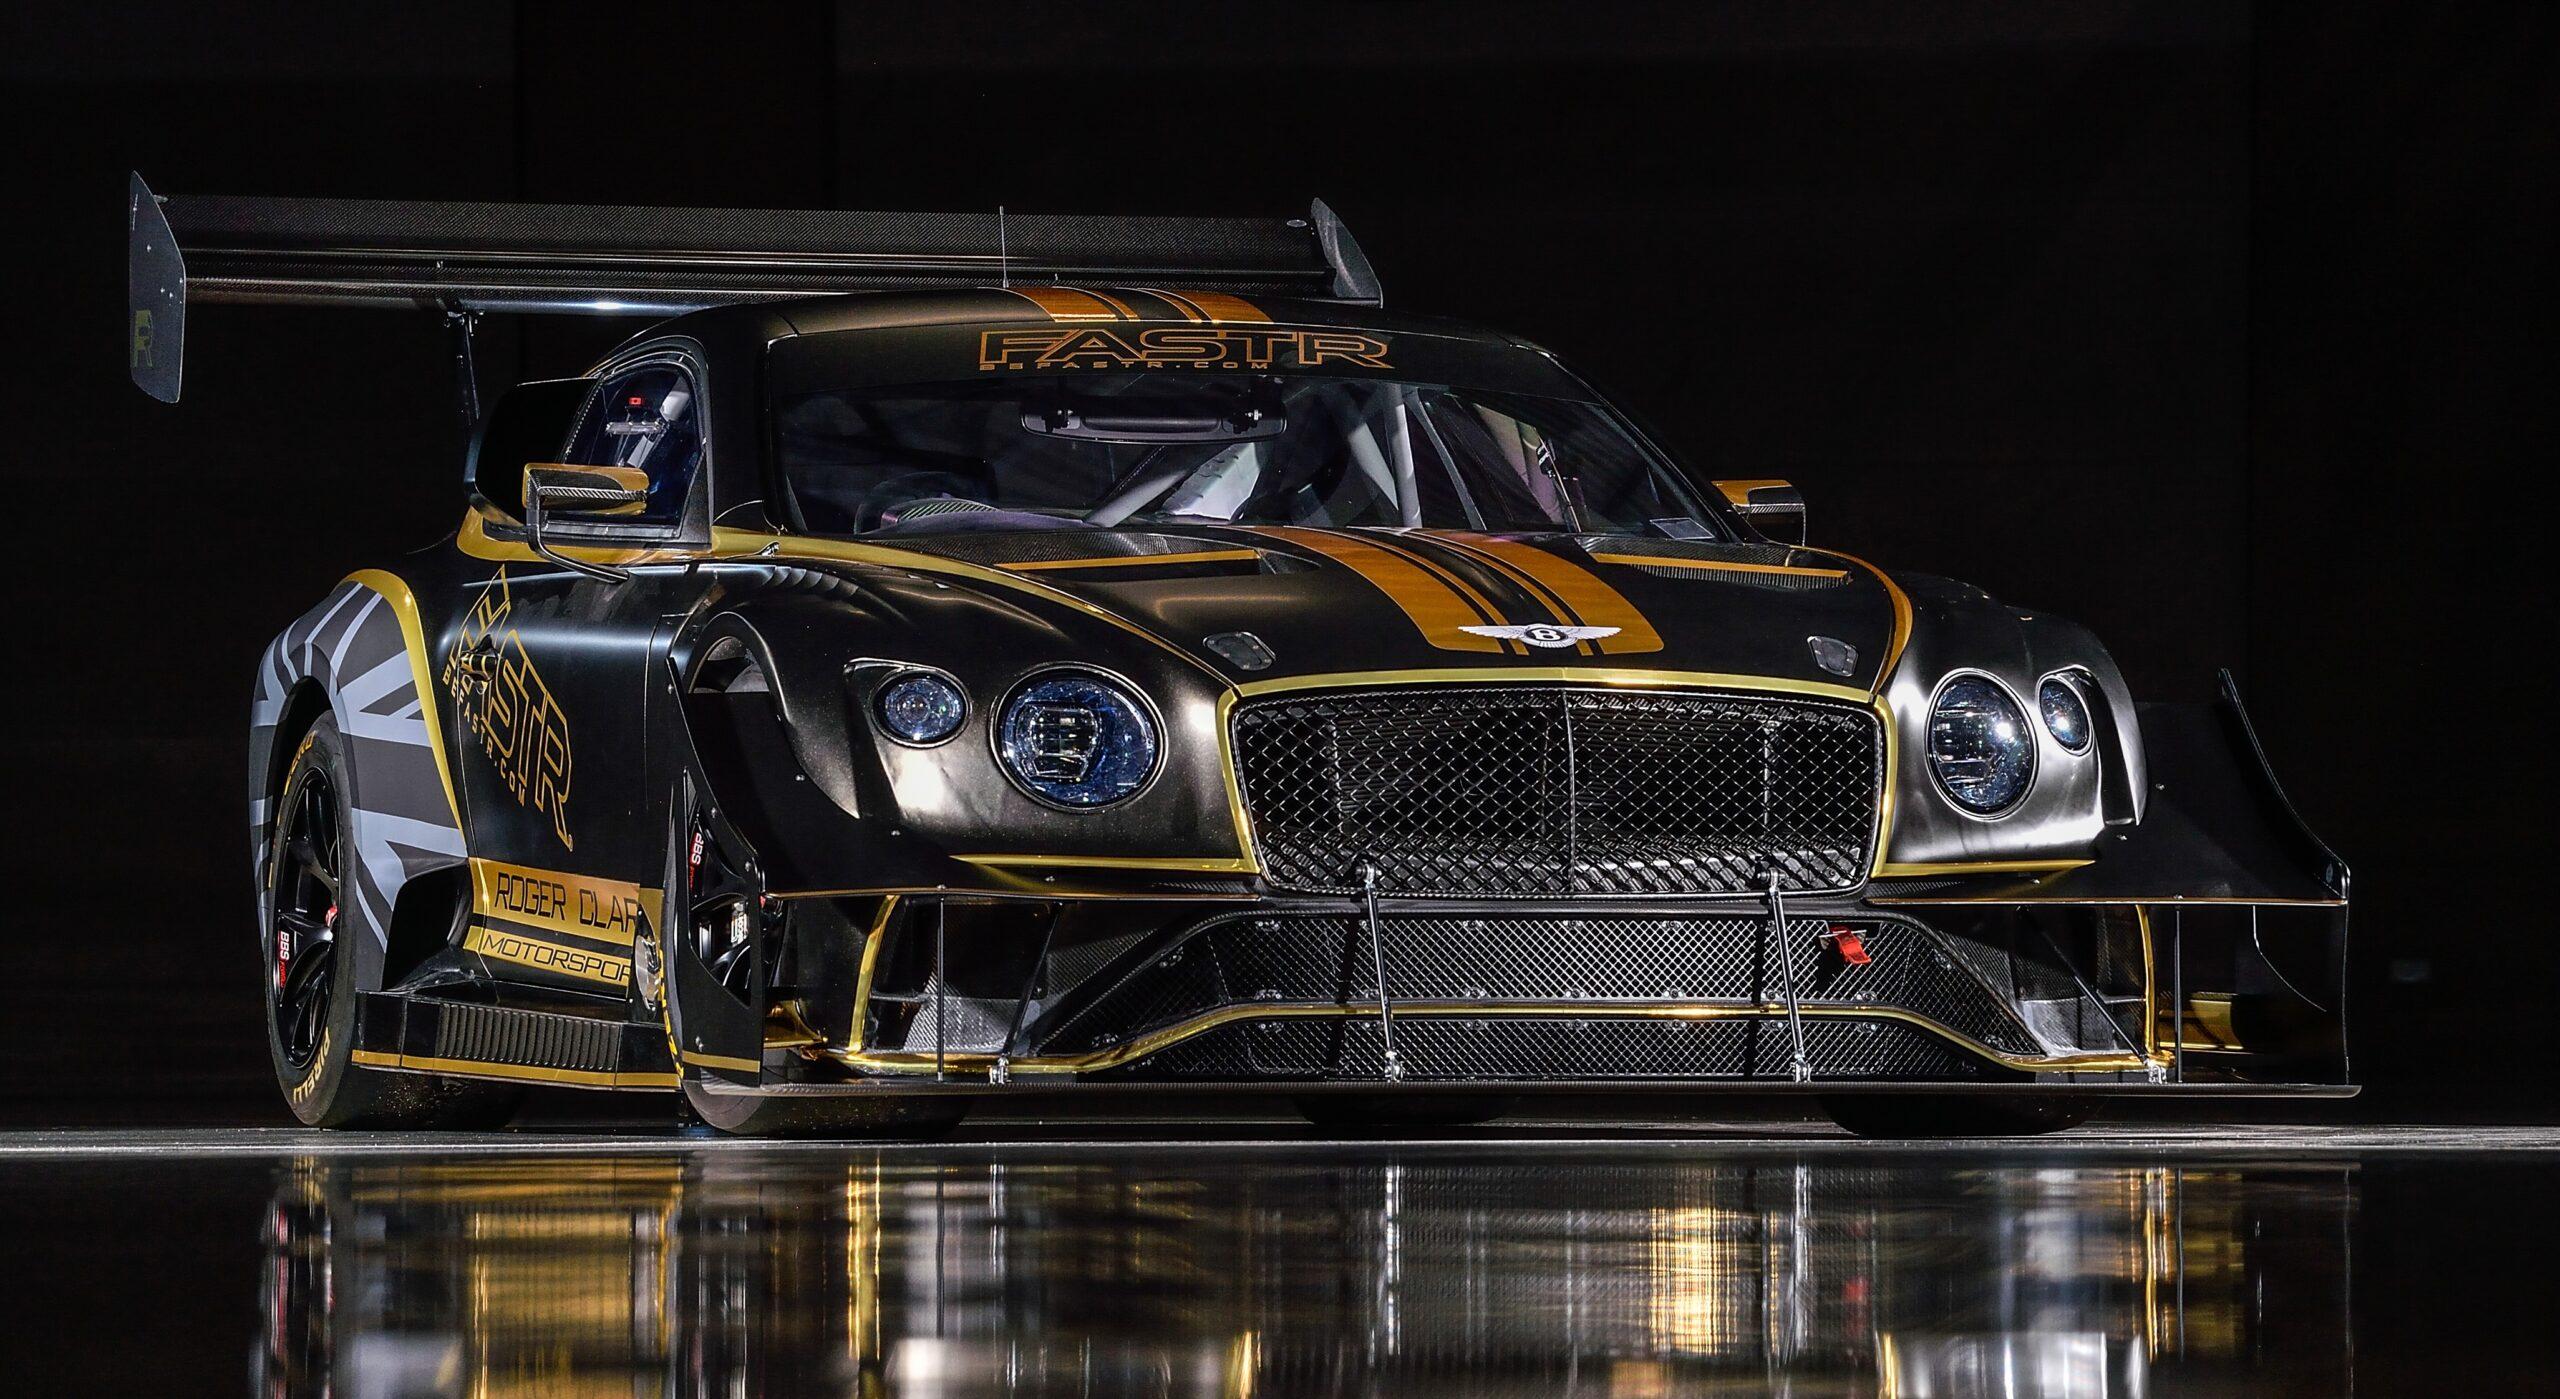 Bentley Continental GT3 per la Pikes Peak Racer: tutte le informazioni.